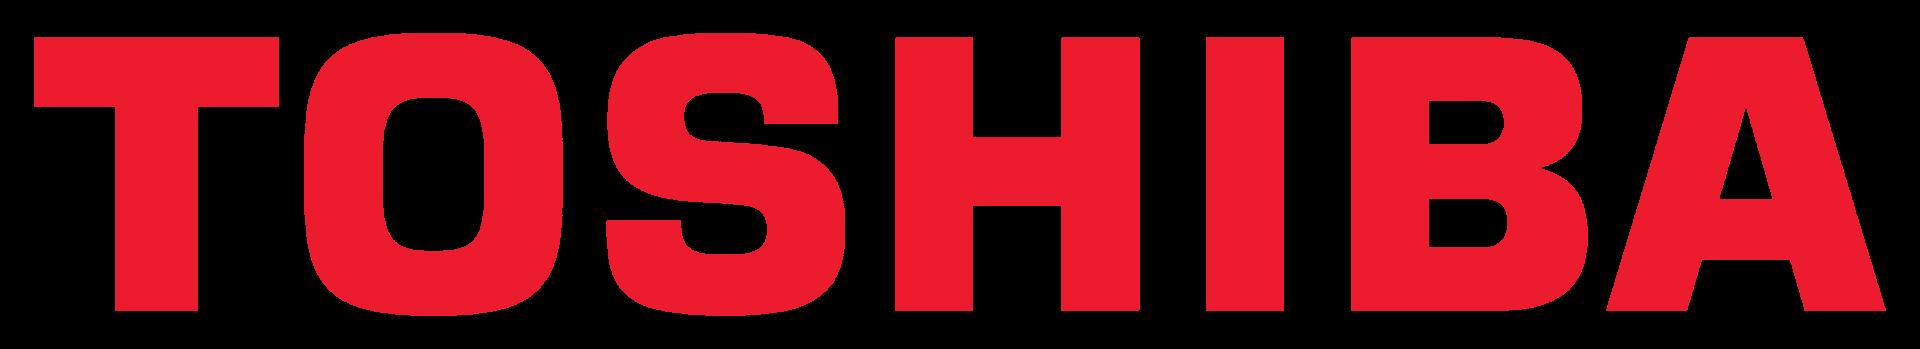 Toshiba